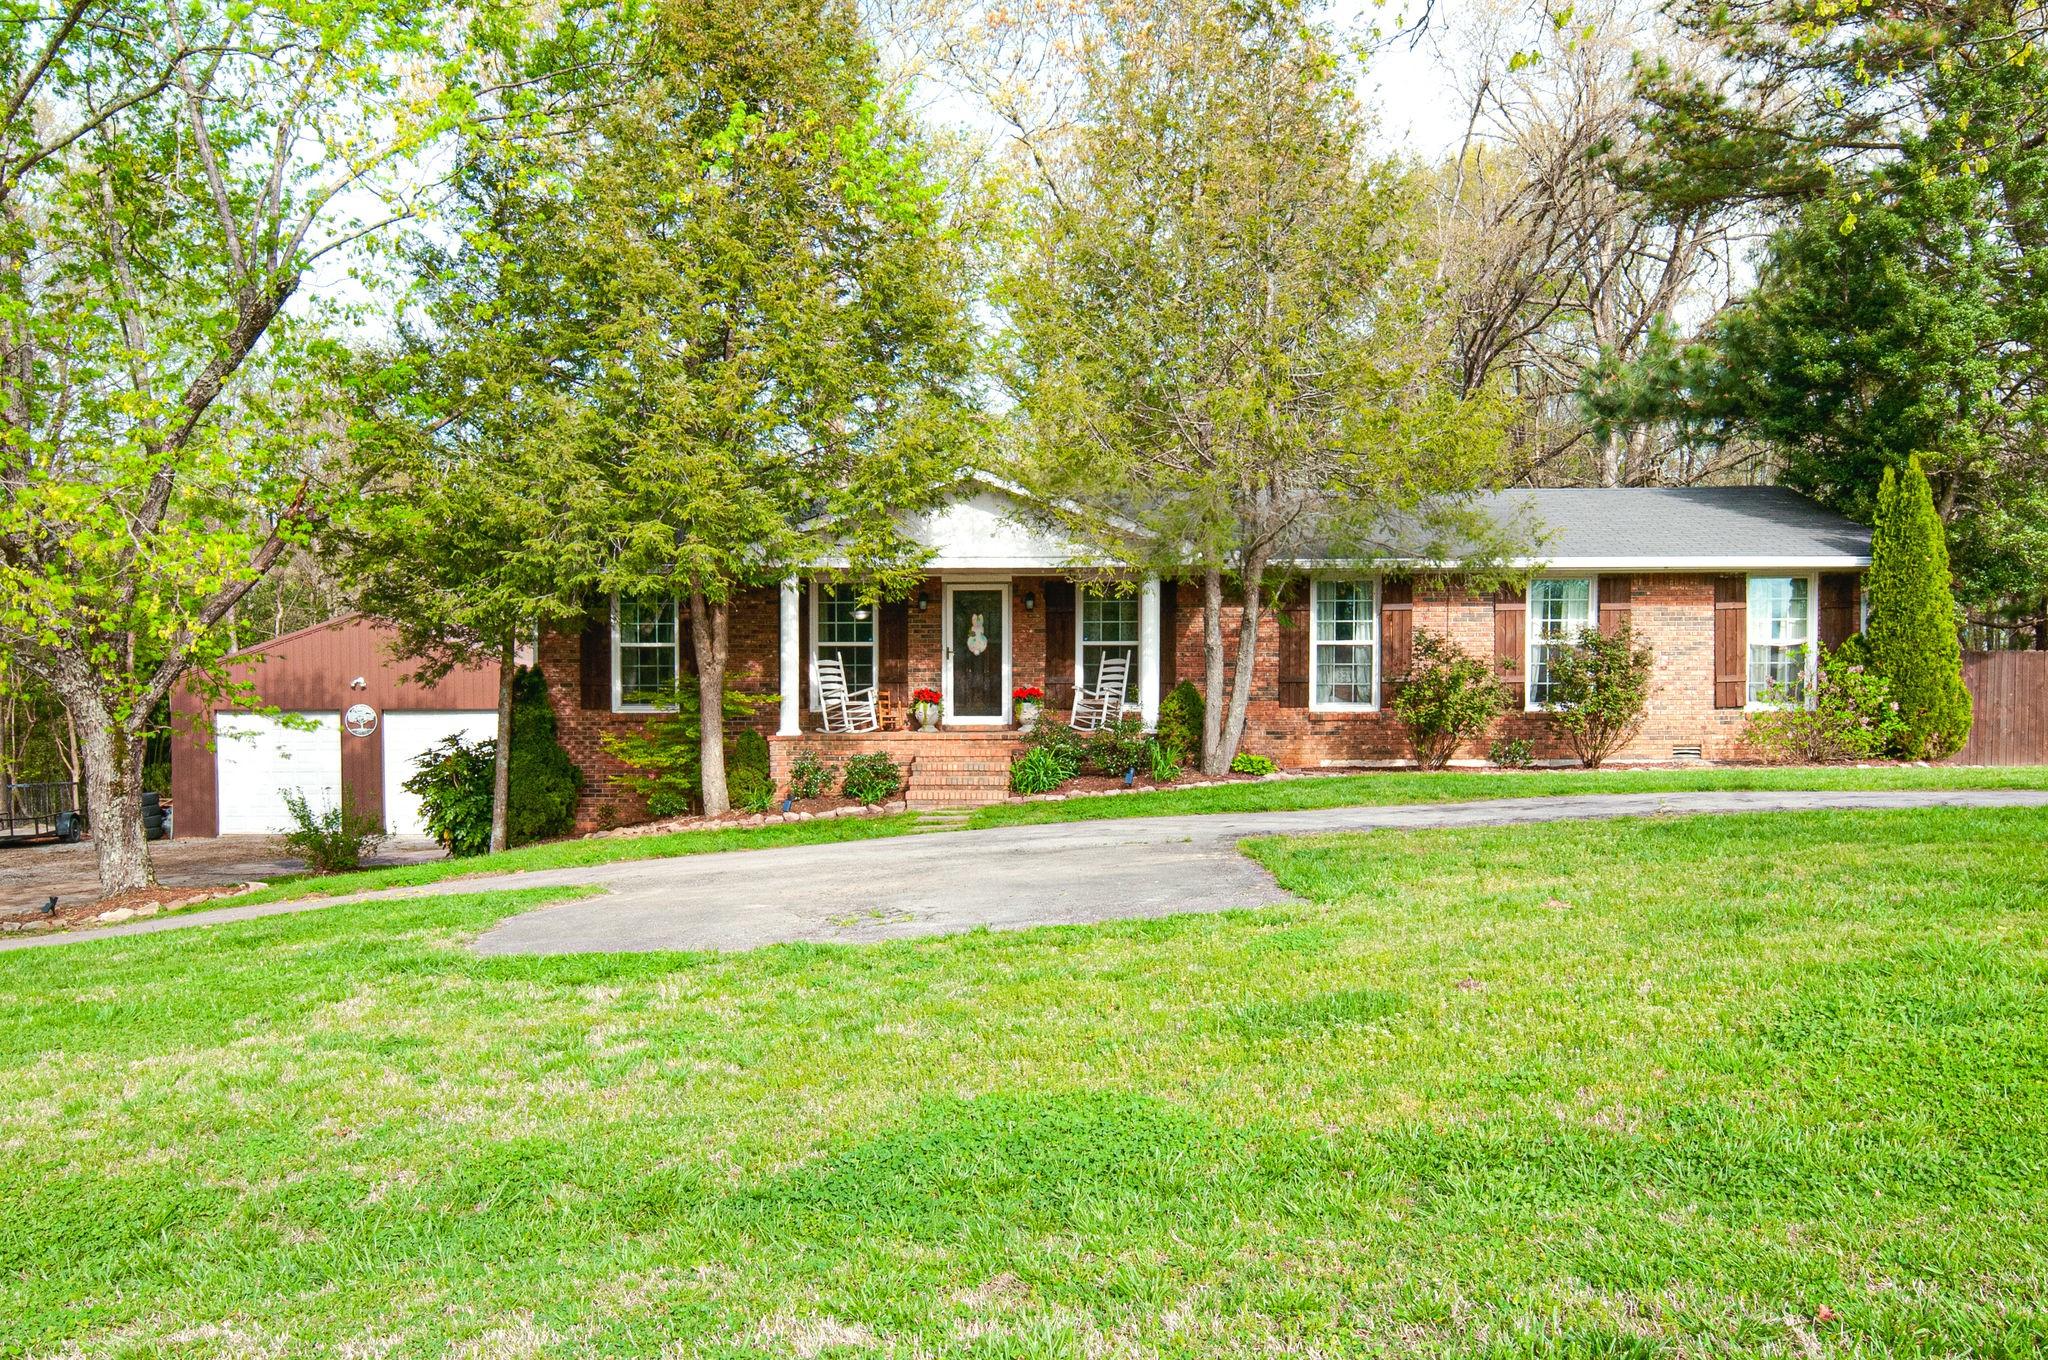 2055 Milliken Rd, Joelton, TN 37080 - Joelton, TN real estate listing